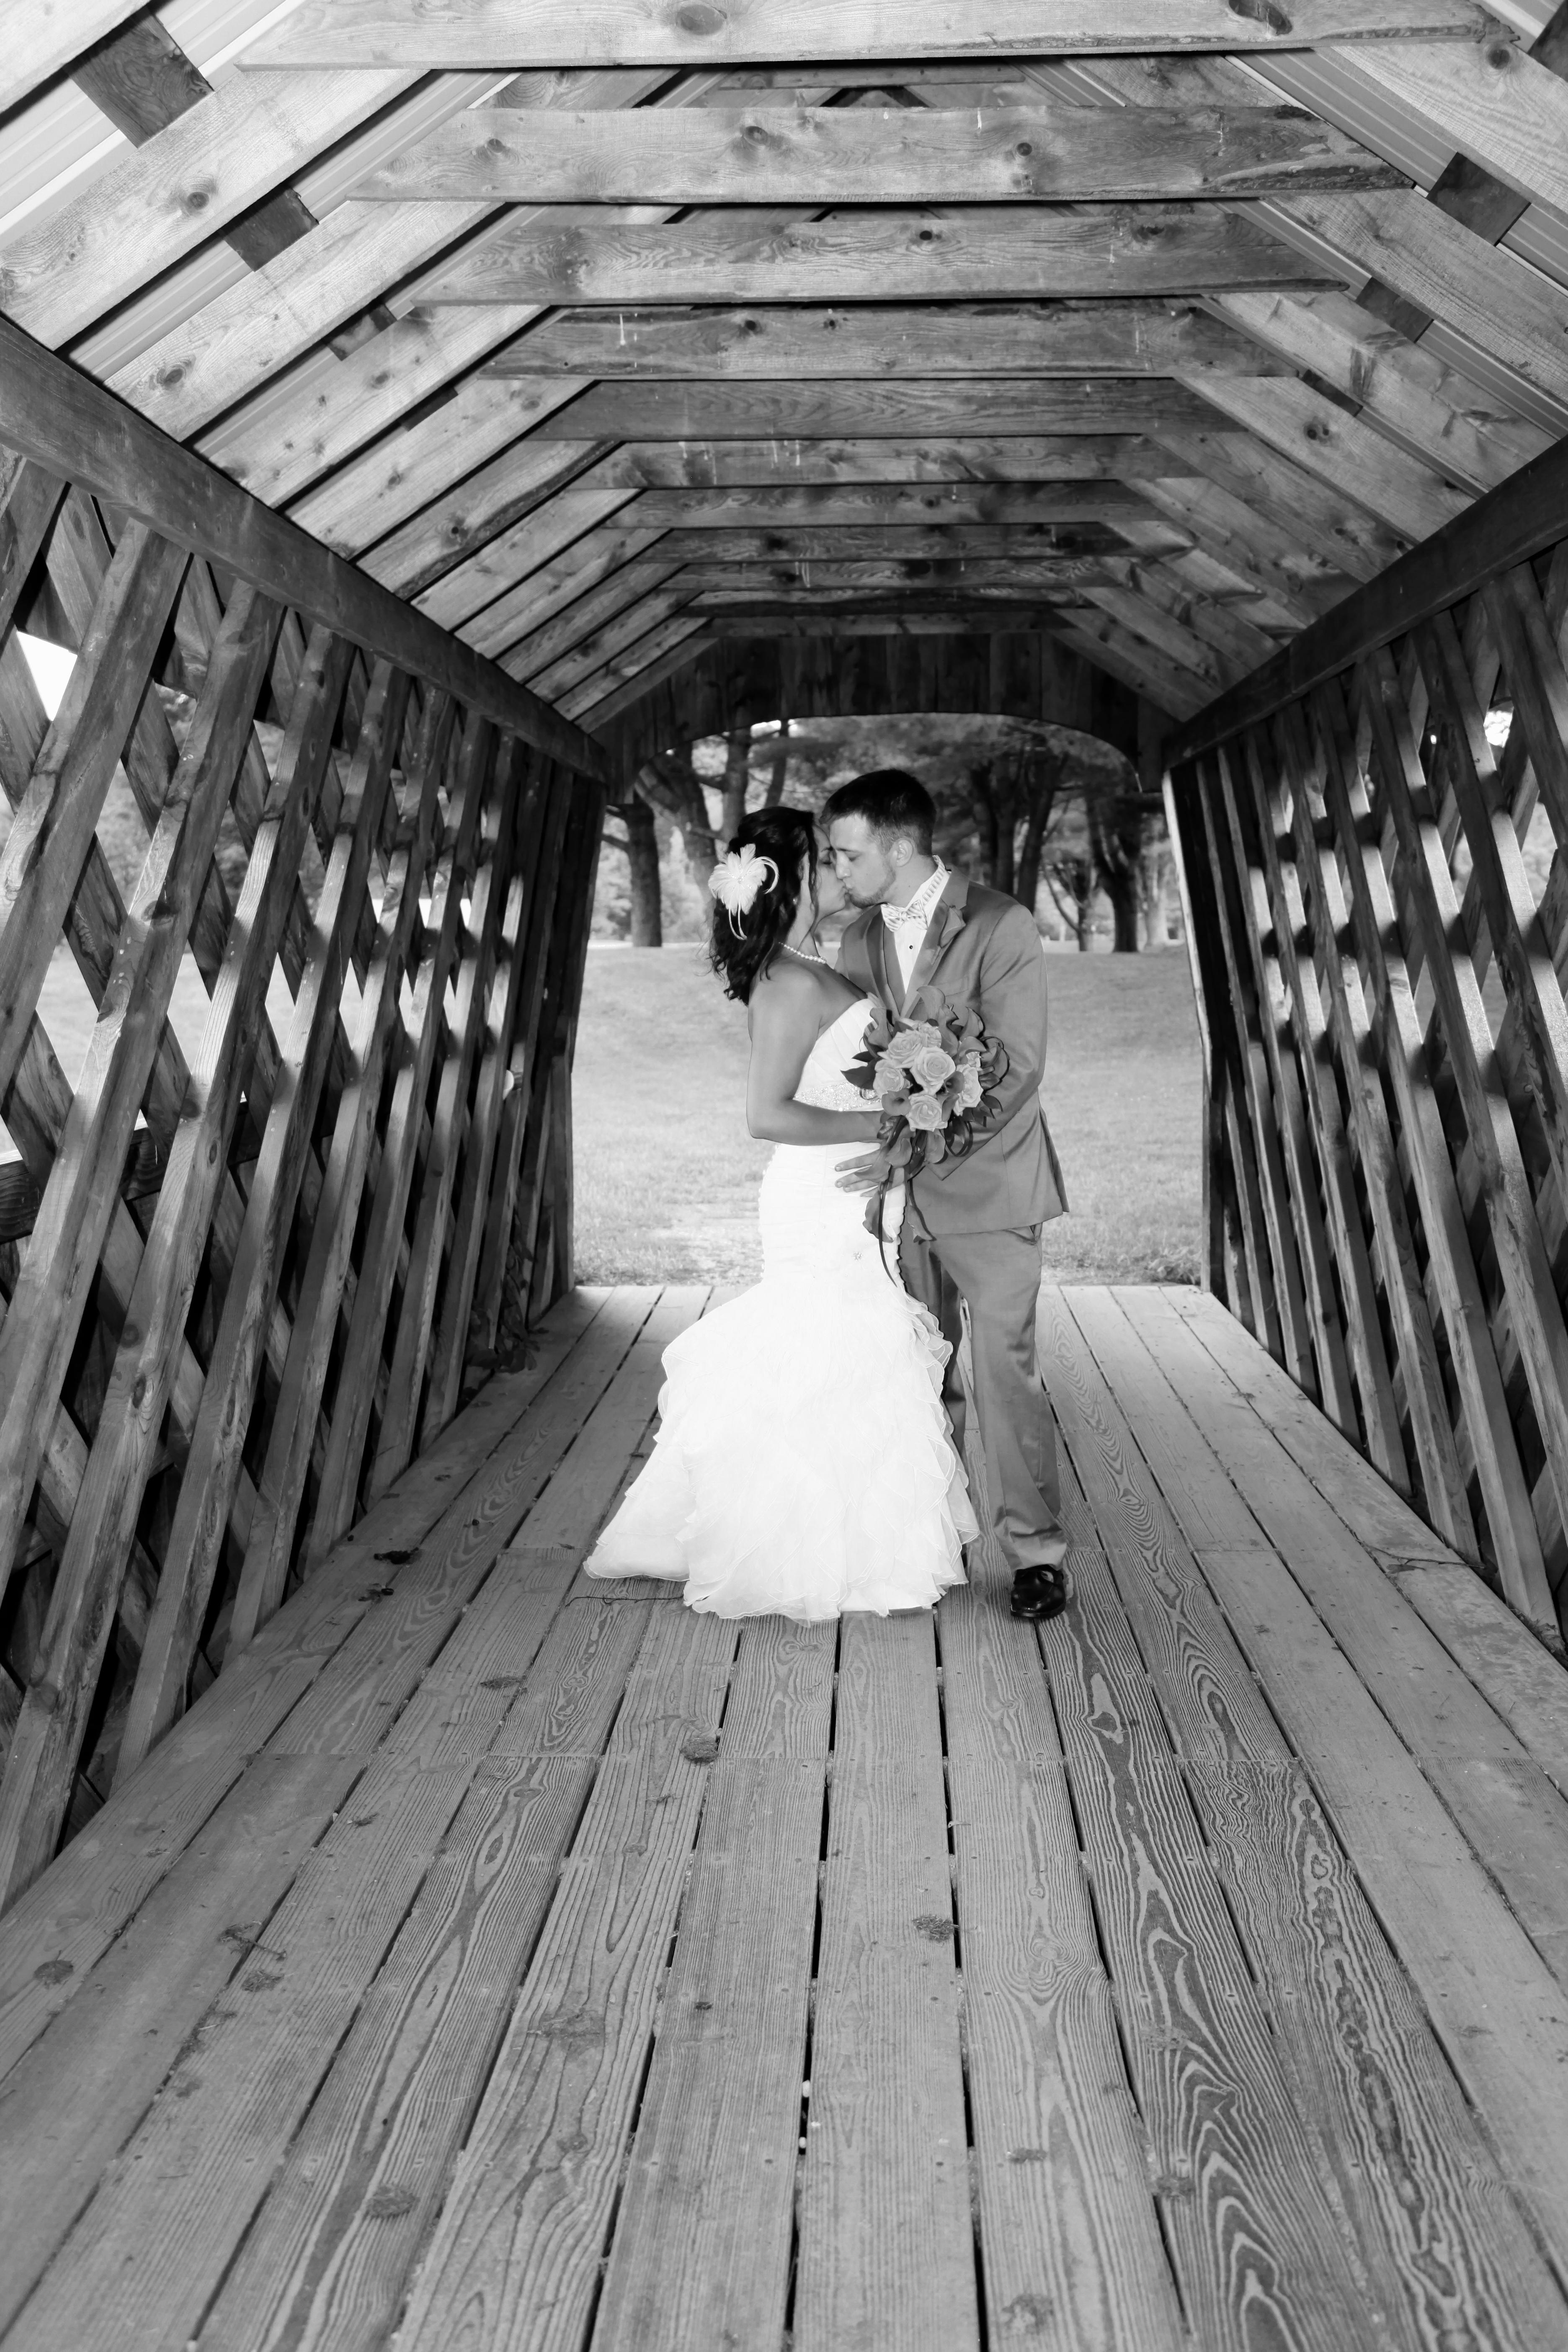 Kiss on a covered bridge